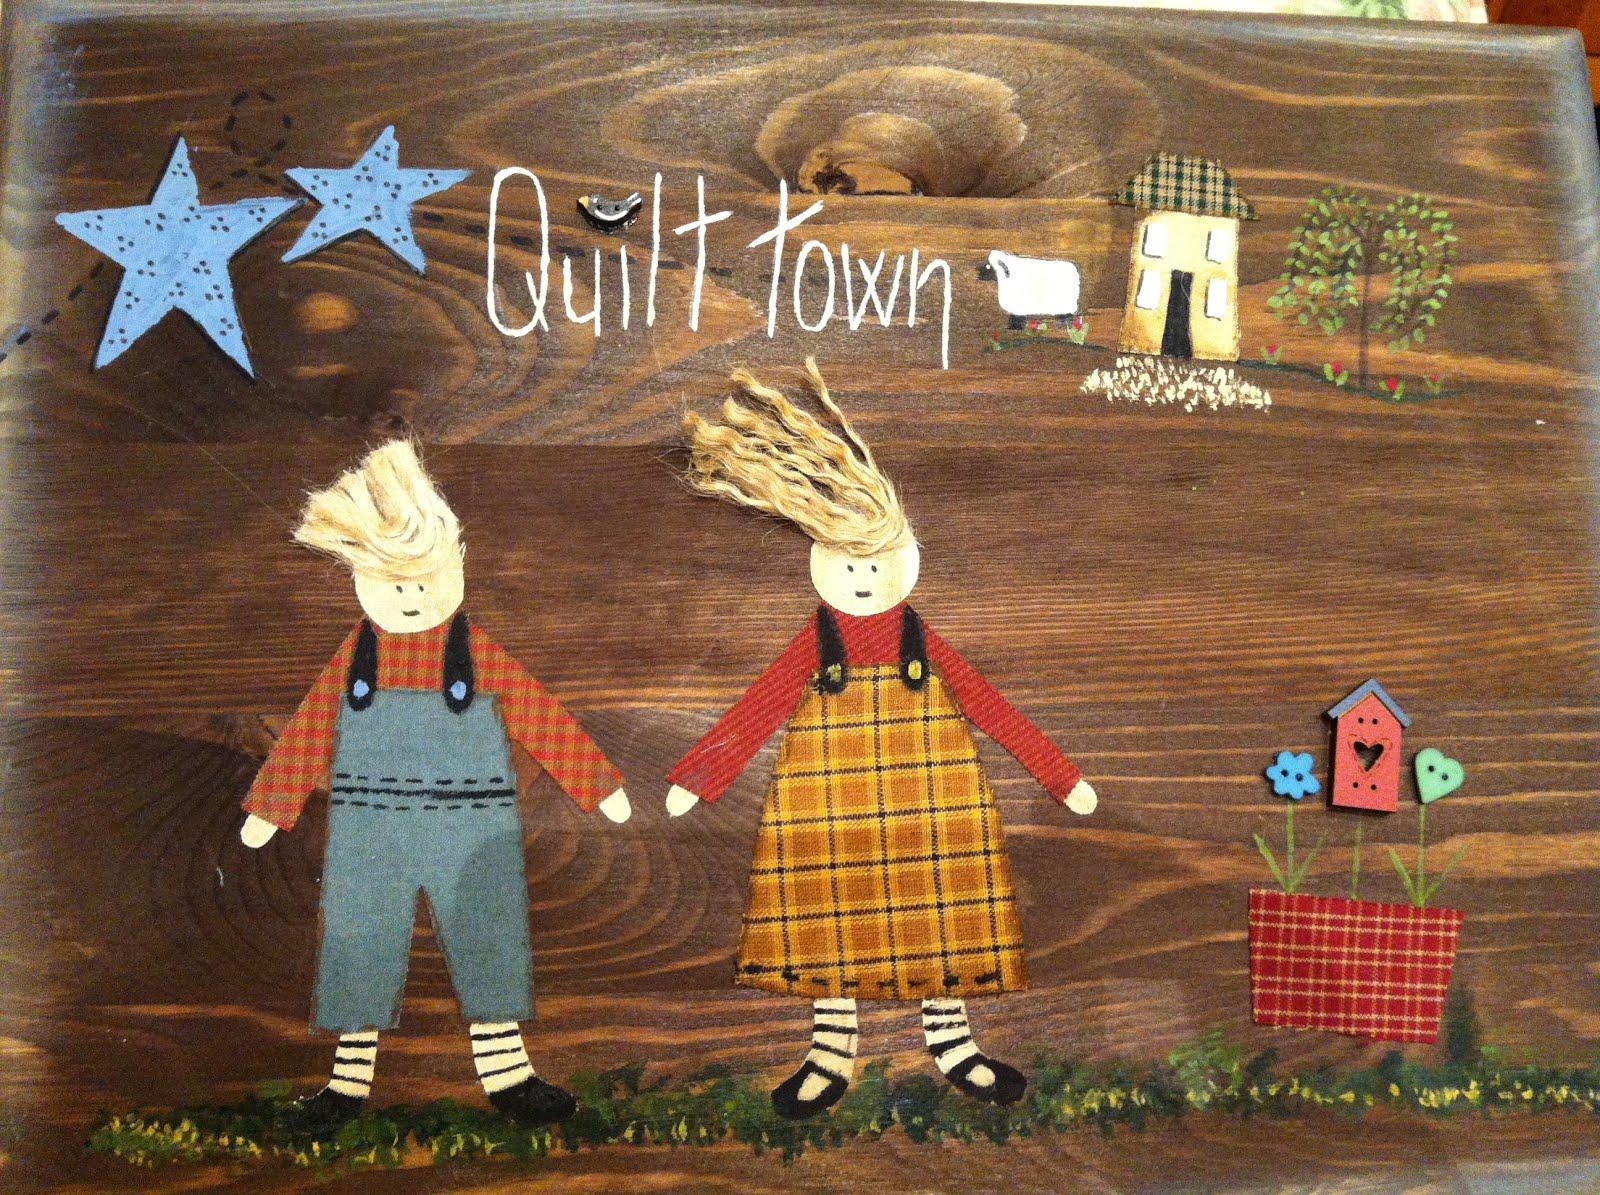 Quilt town